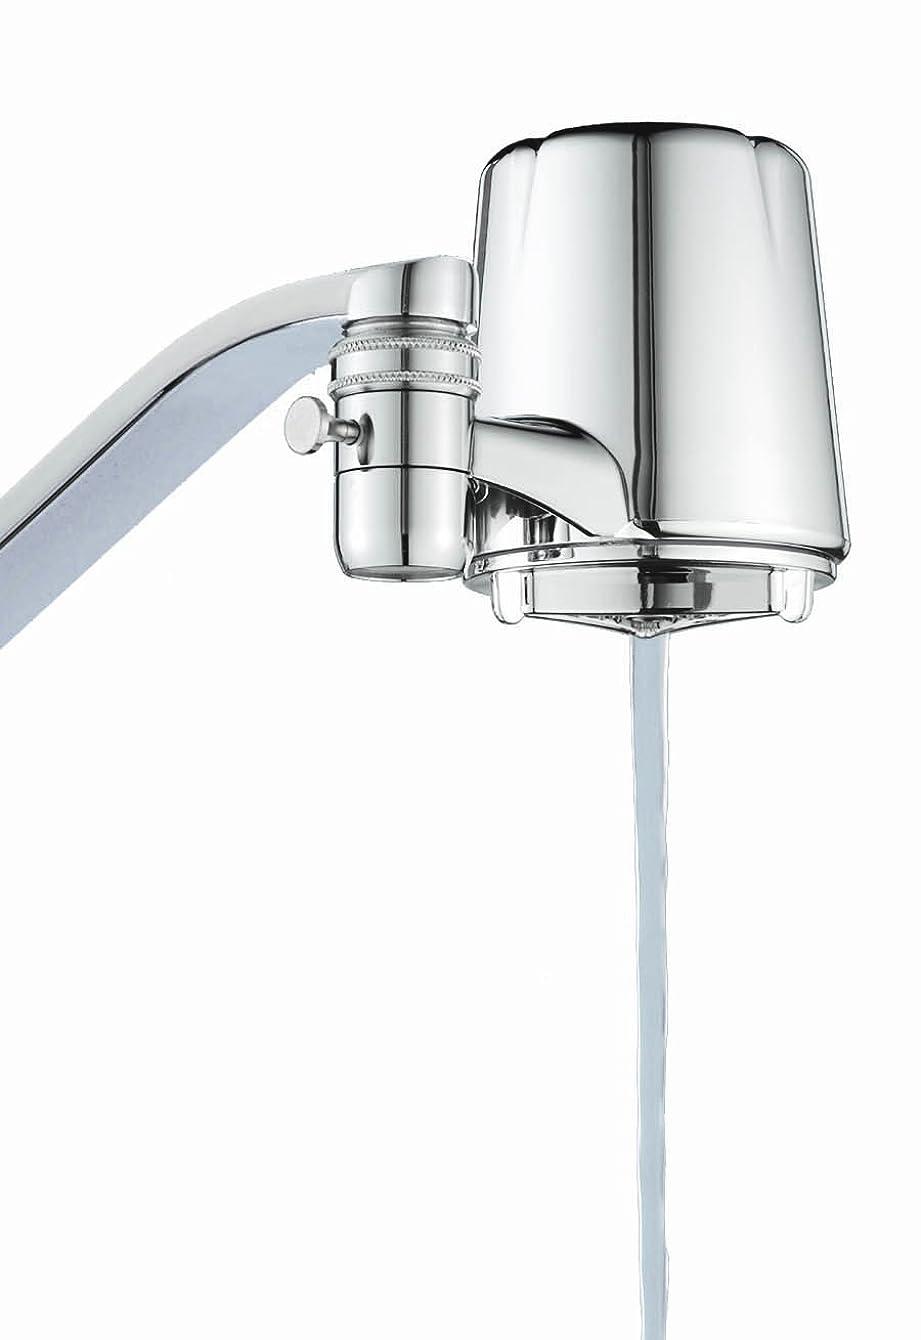 Culligan FM-25 Faucet Mount Filter with Advanced Water Filtration, Chrome Finish gjkmrutczoycz34